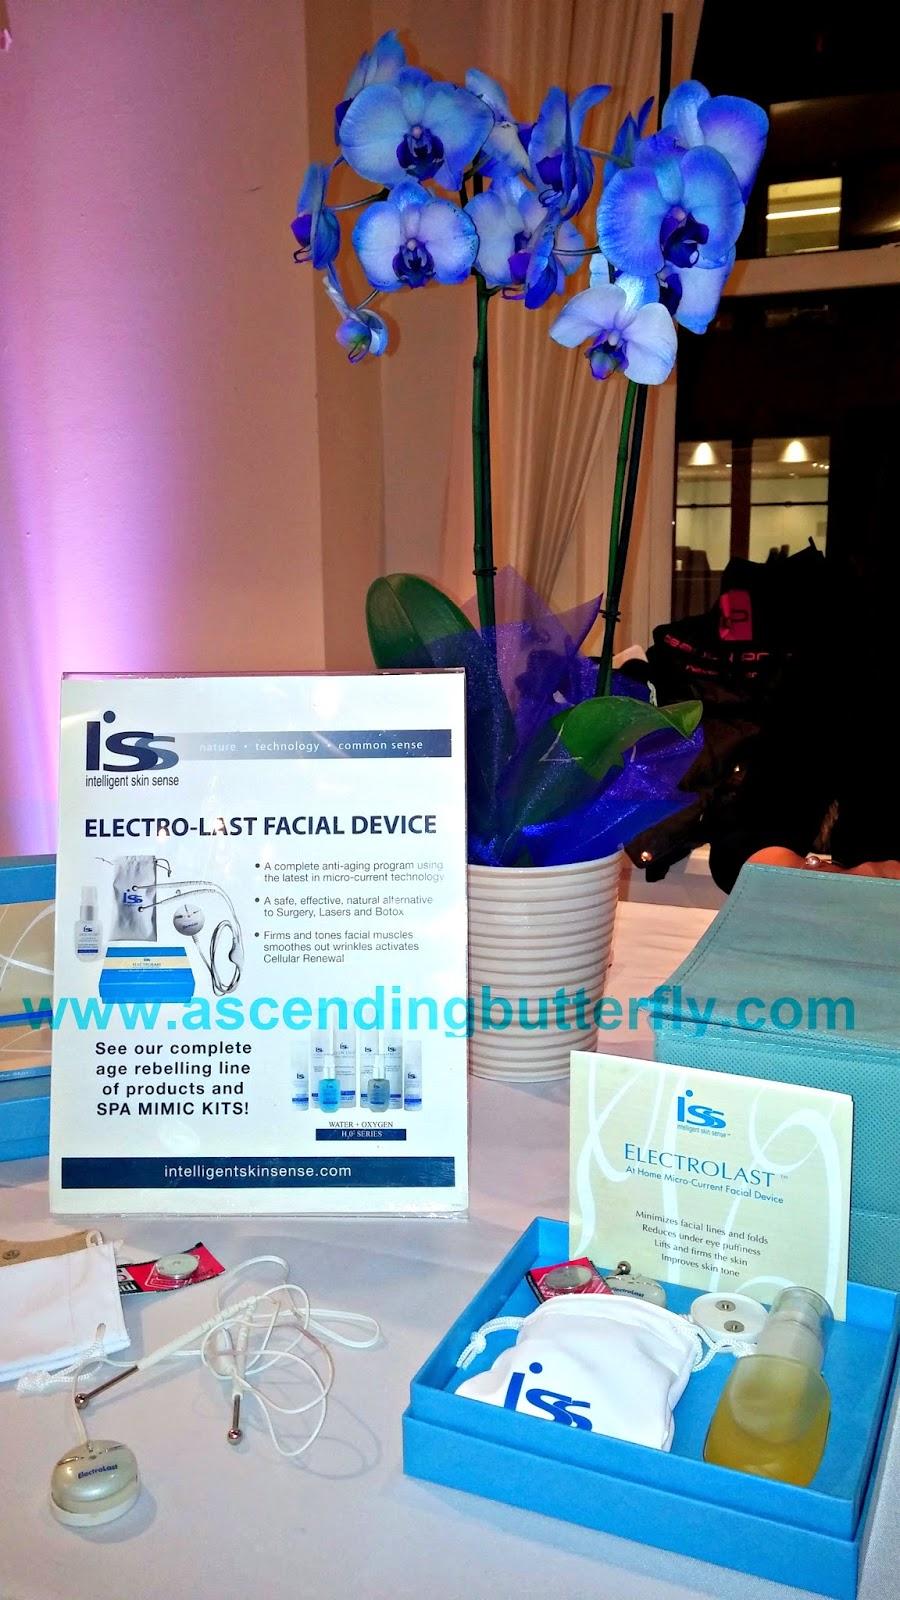 Intelligent Skin Sense, Skincare